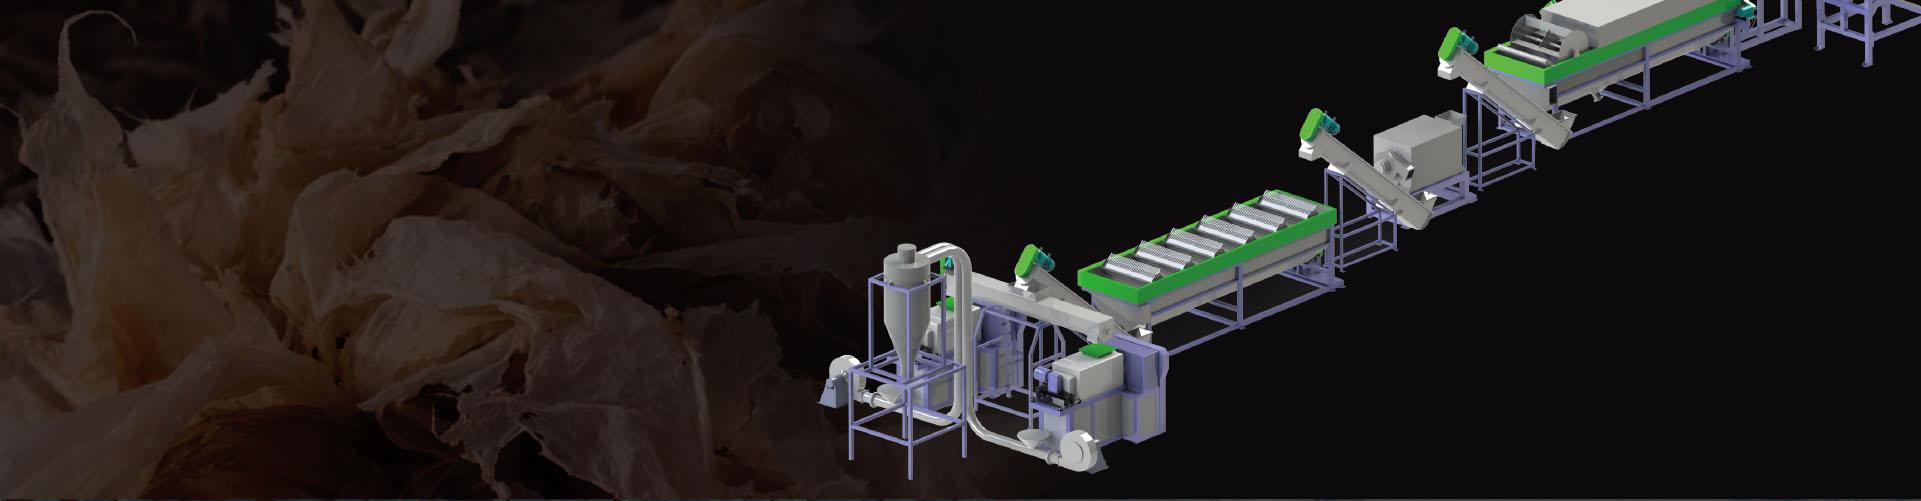 Plastic Film Recycling Washing Line